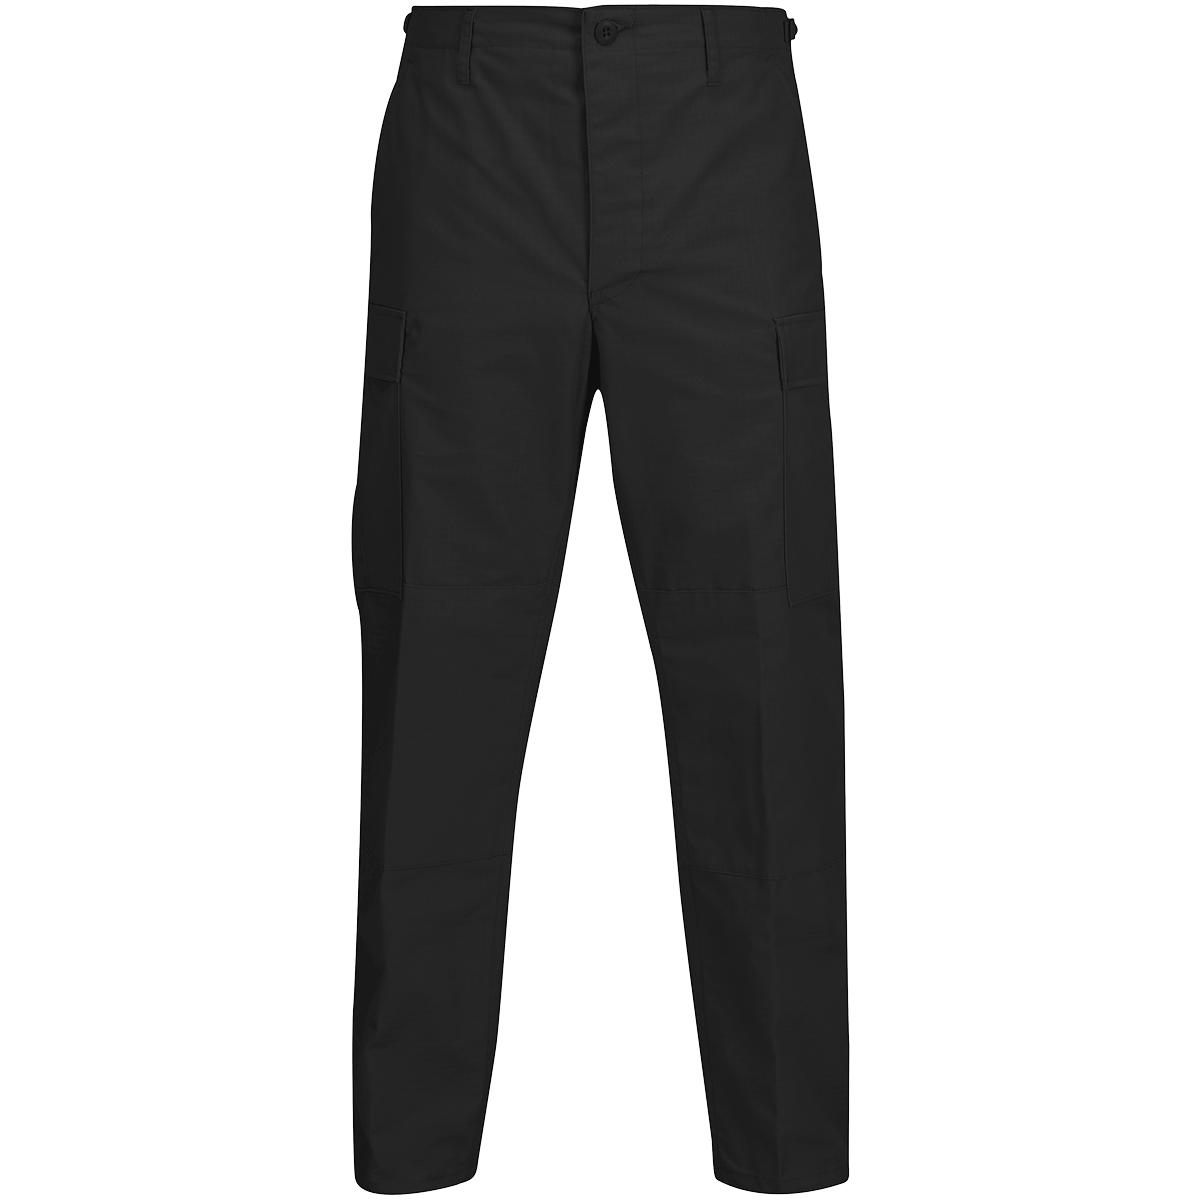 Propper-Bdu-Pantalones-Boton-Ripstop-Hombre-Mosca-Policia-Seguridad-Negro